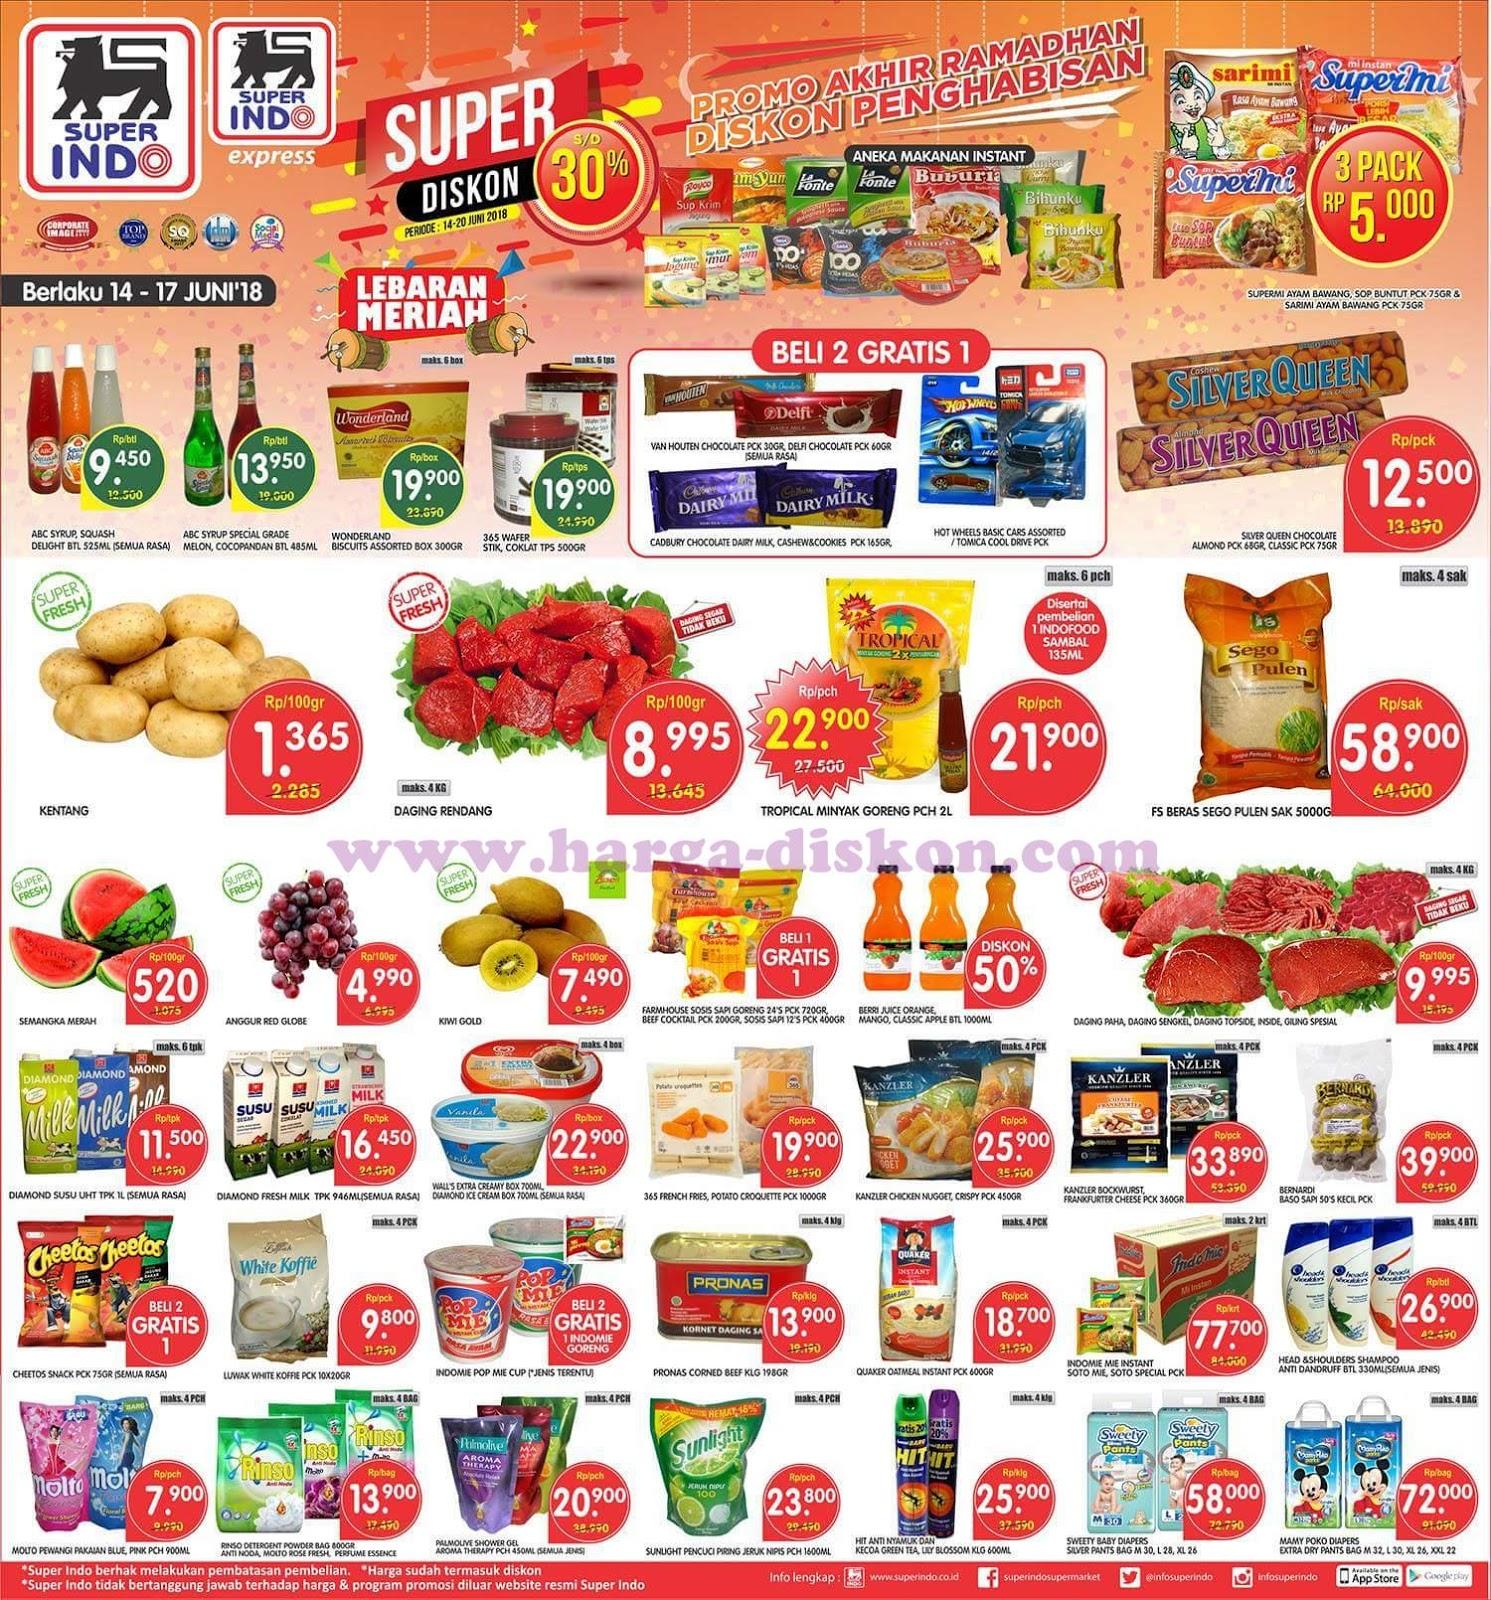 Voucher Superindo Rp 200000 Daftar Harga Terkini Indonesia 300000 Amazing Promo Jsm Katalog Weekend Dan Promosi Super